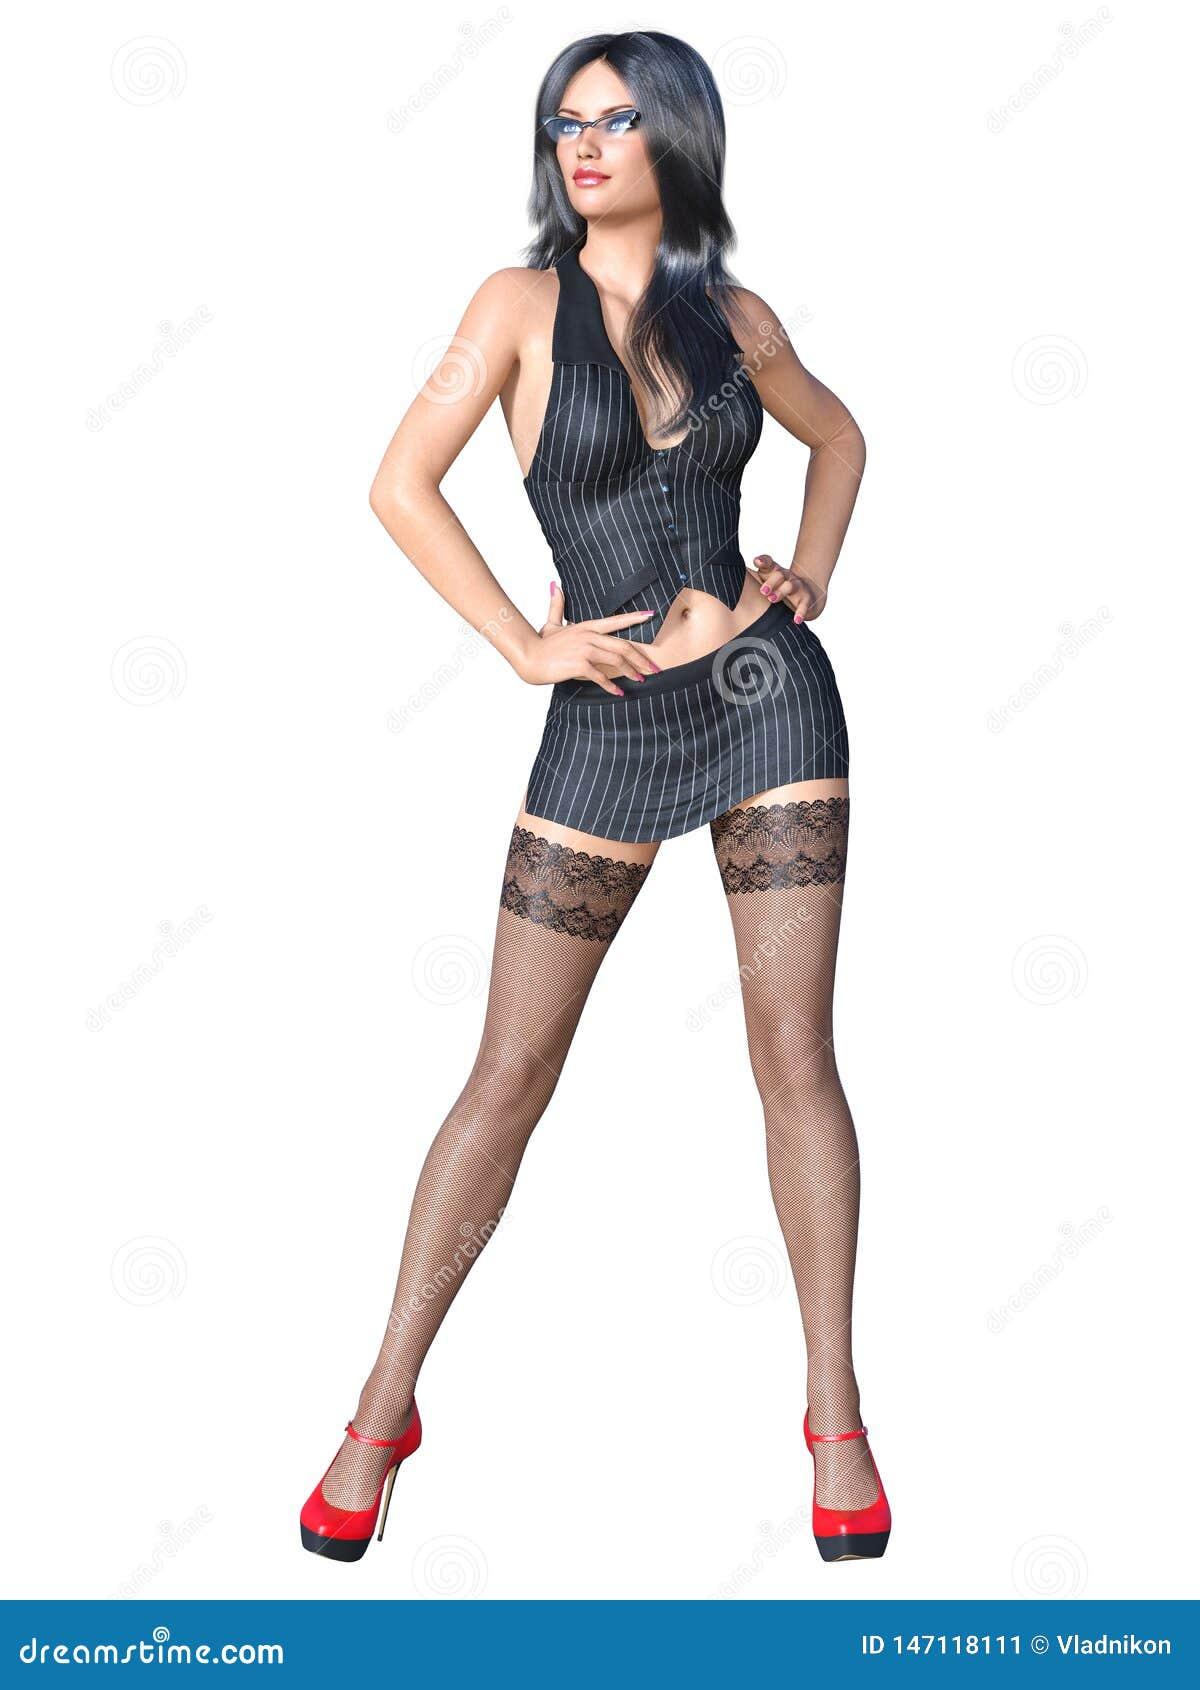 Mini skirt secretary glasses